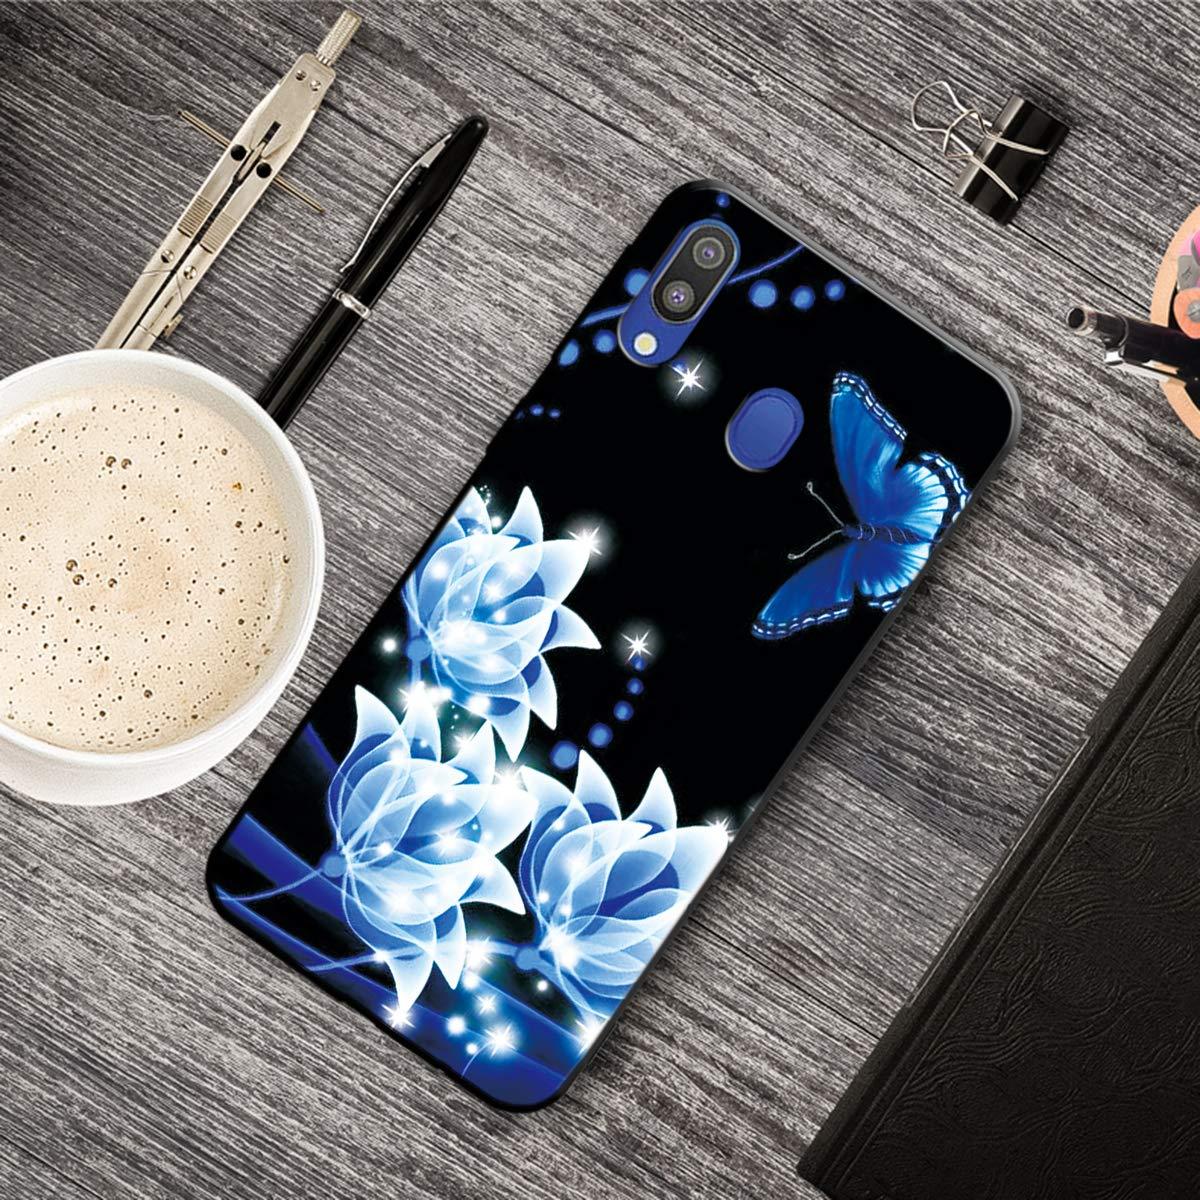 Carcasa para Samsung Galaxy A20 Silicona Antigolpes Suave Flexible TPU Ultra Delgado Ligero Gel Goma Cubierta Case Jalea Protectora Bumper Negro Tigre Funda Samsung Galaxy A20